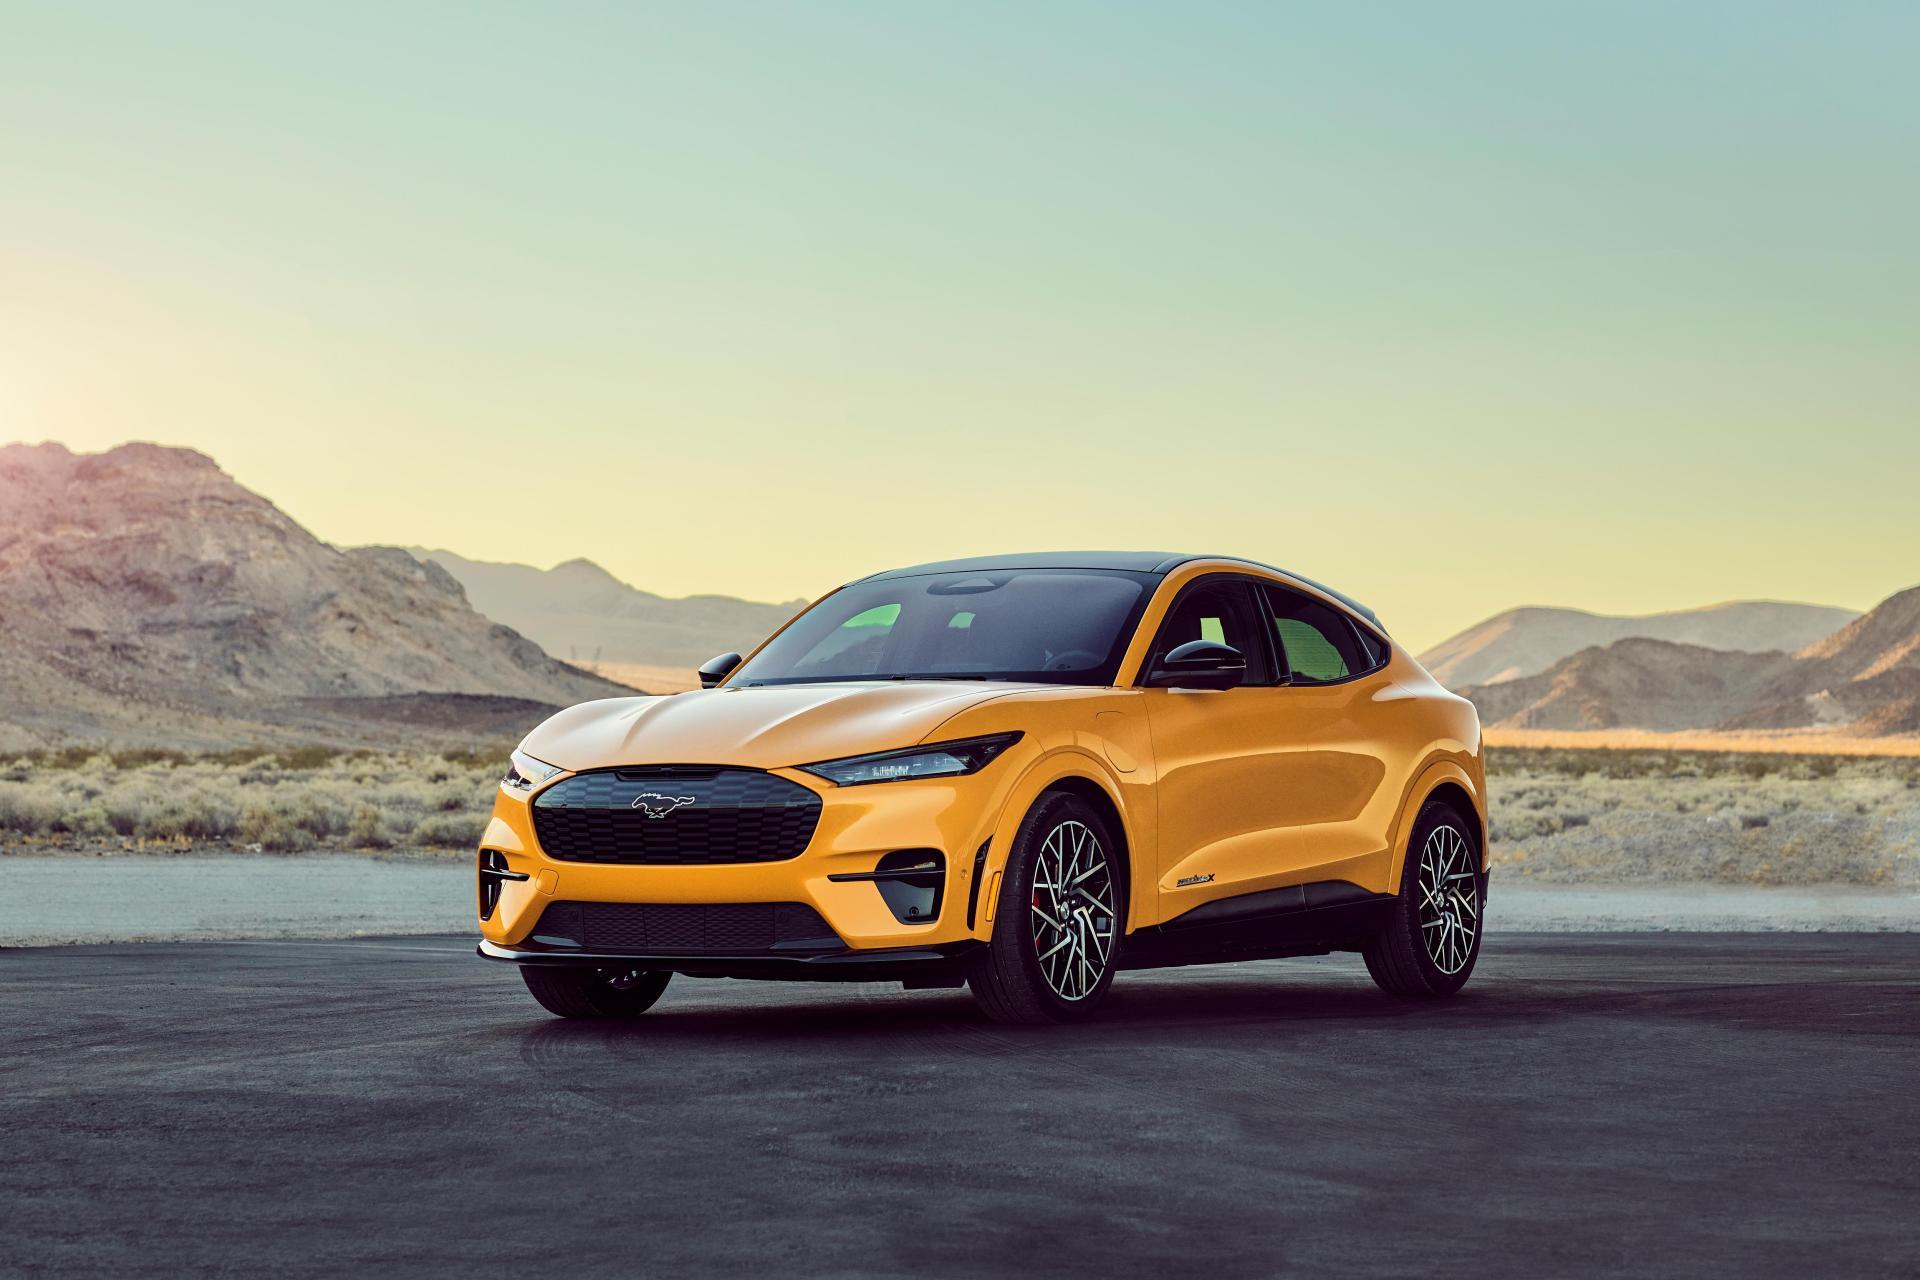 Ford verleiht dem Mustang Mach-E noch mehr Power & Leistung